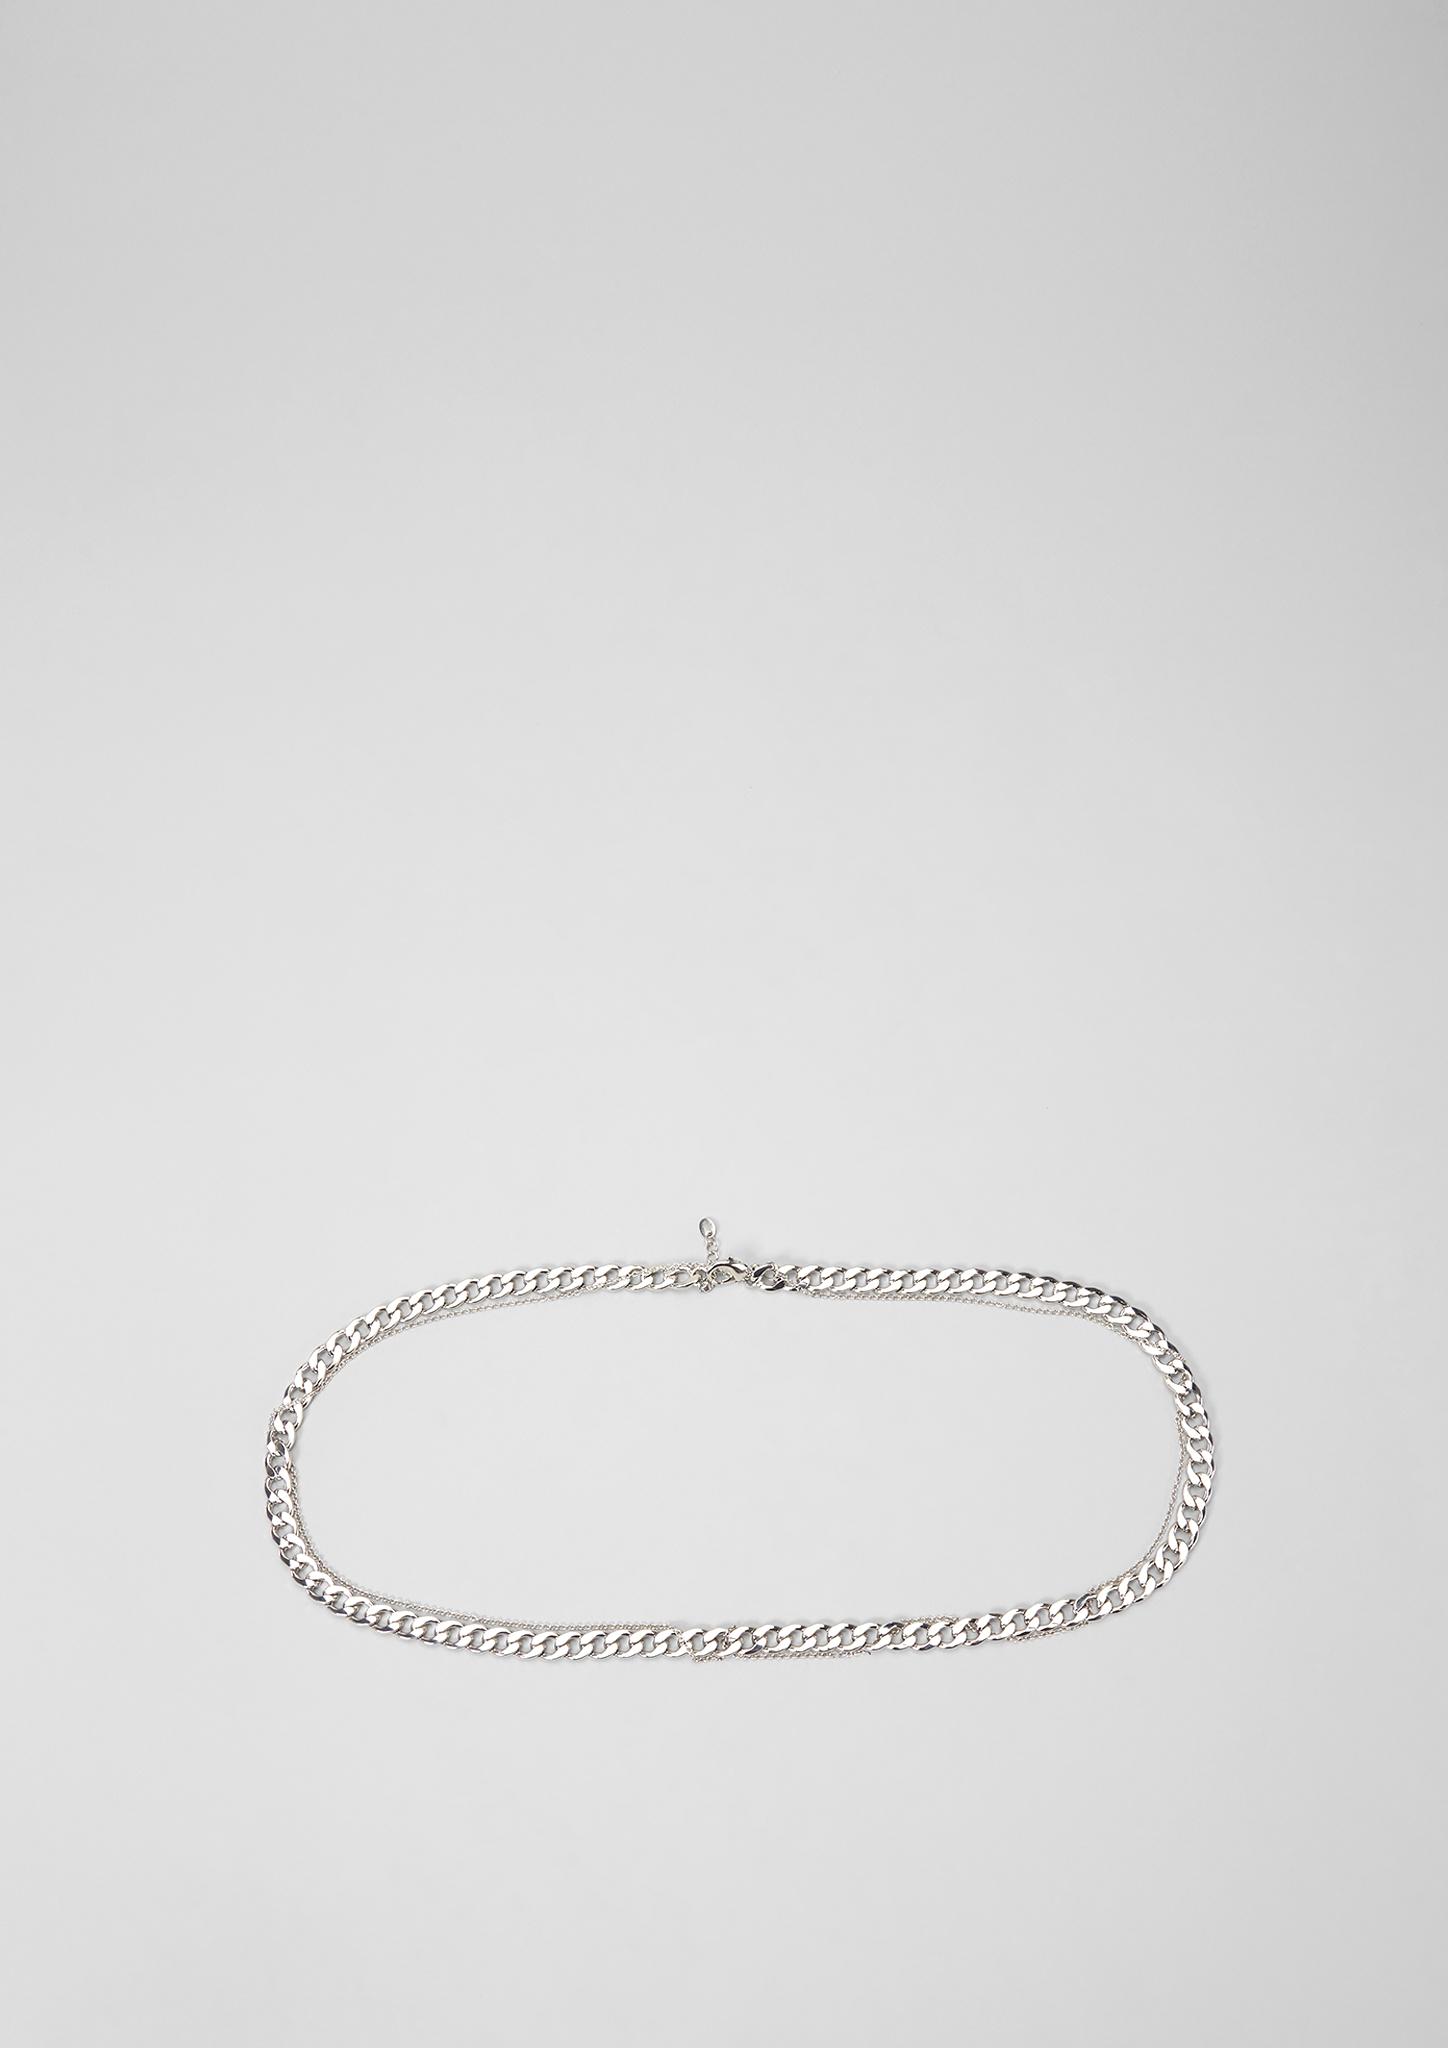 Ketten-Gürtel | Accessoires > Gürtel > Kettengürtel | Silber | 100% metall | s.Oliver